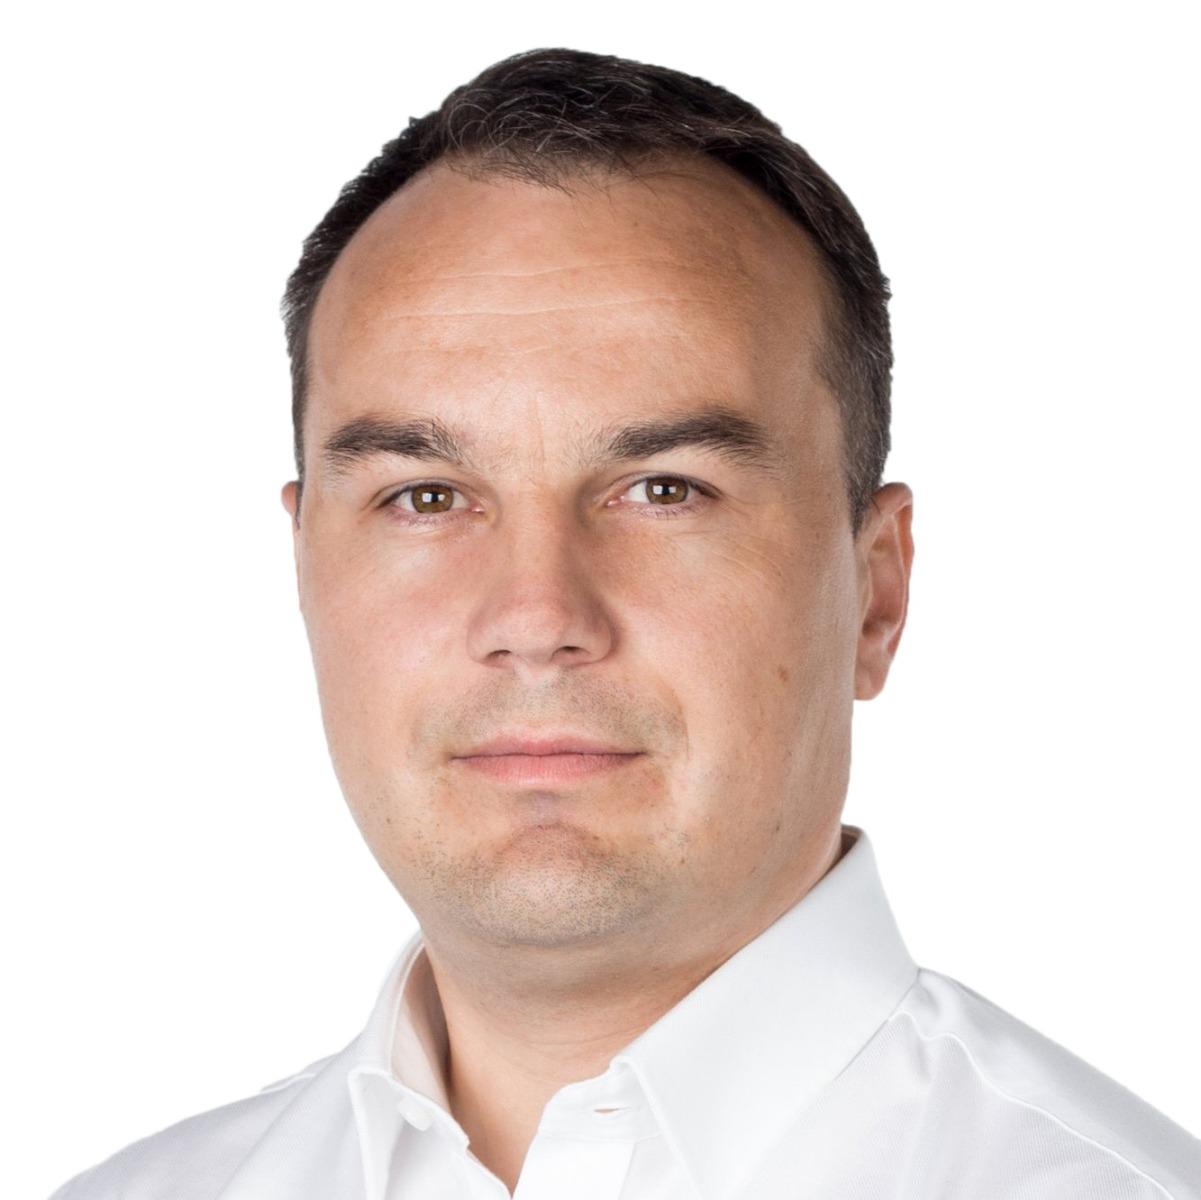 Tomasz Kacprowski